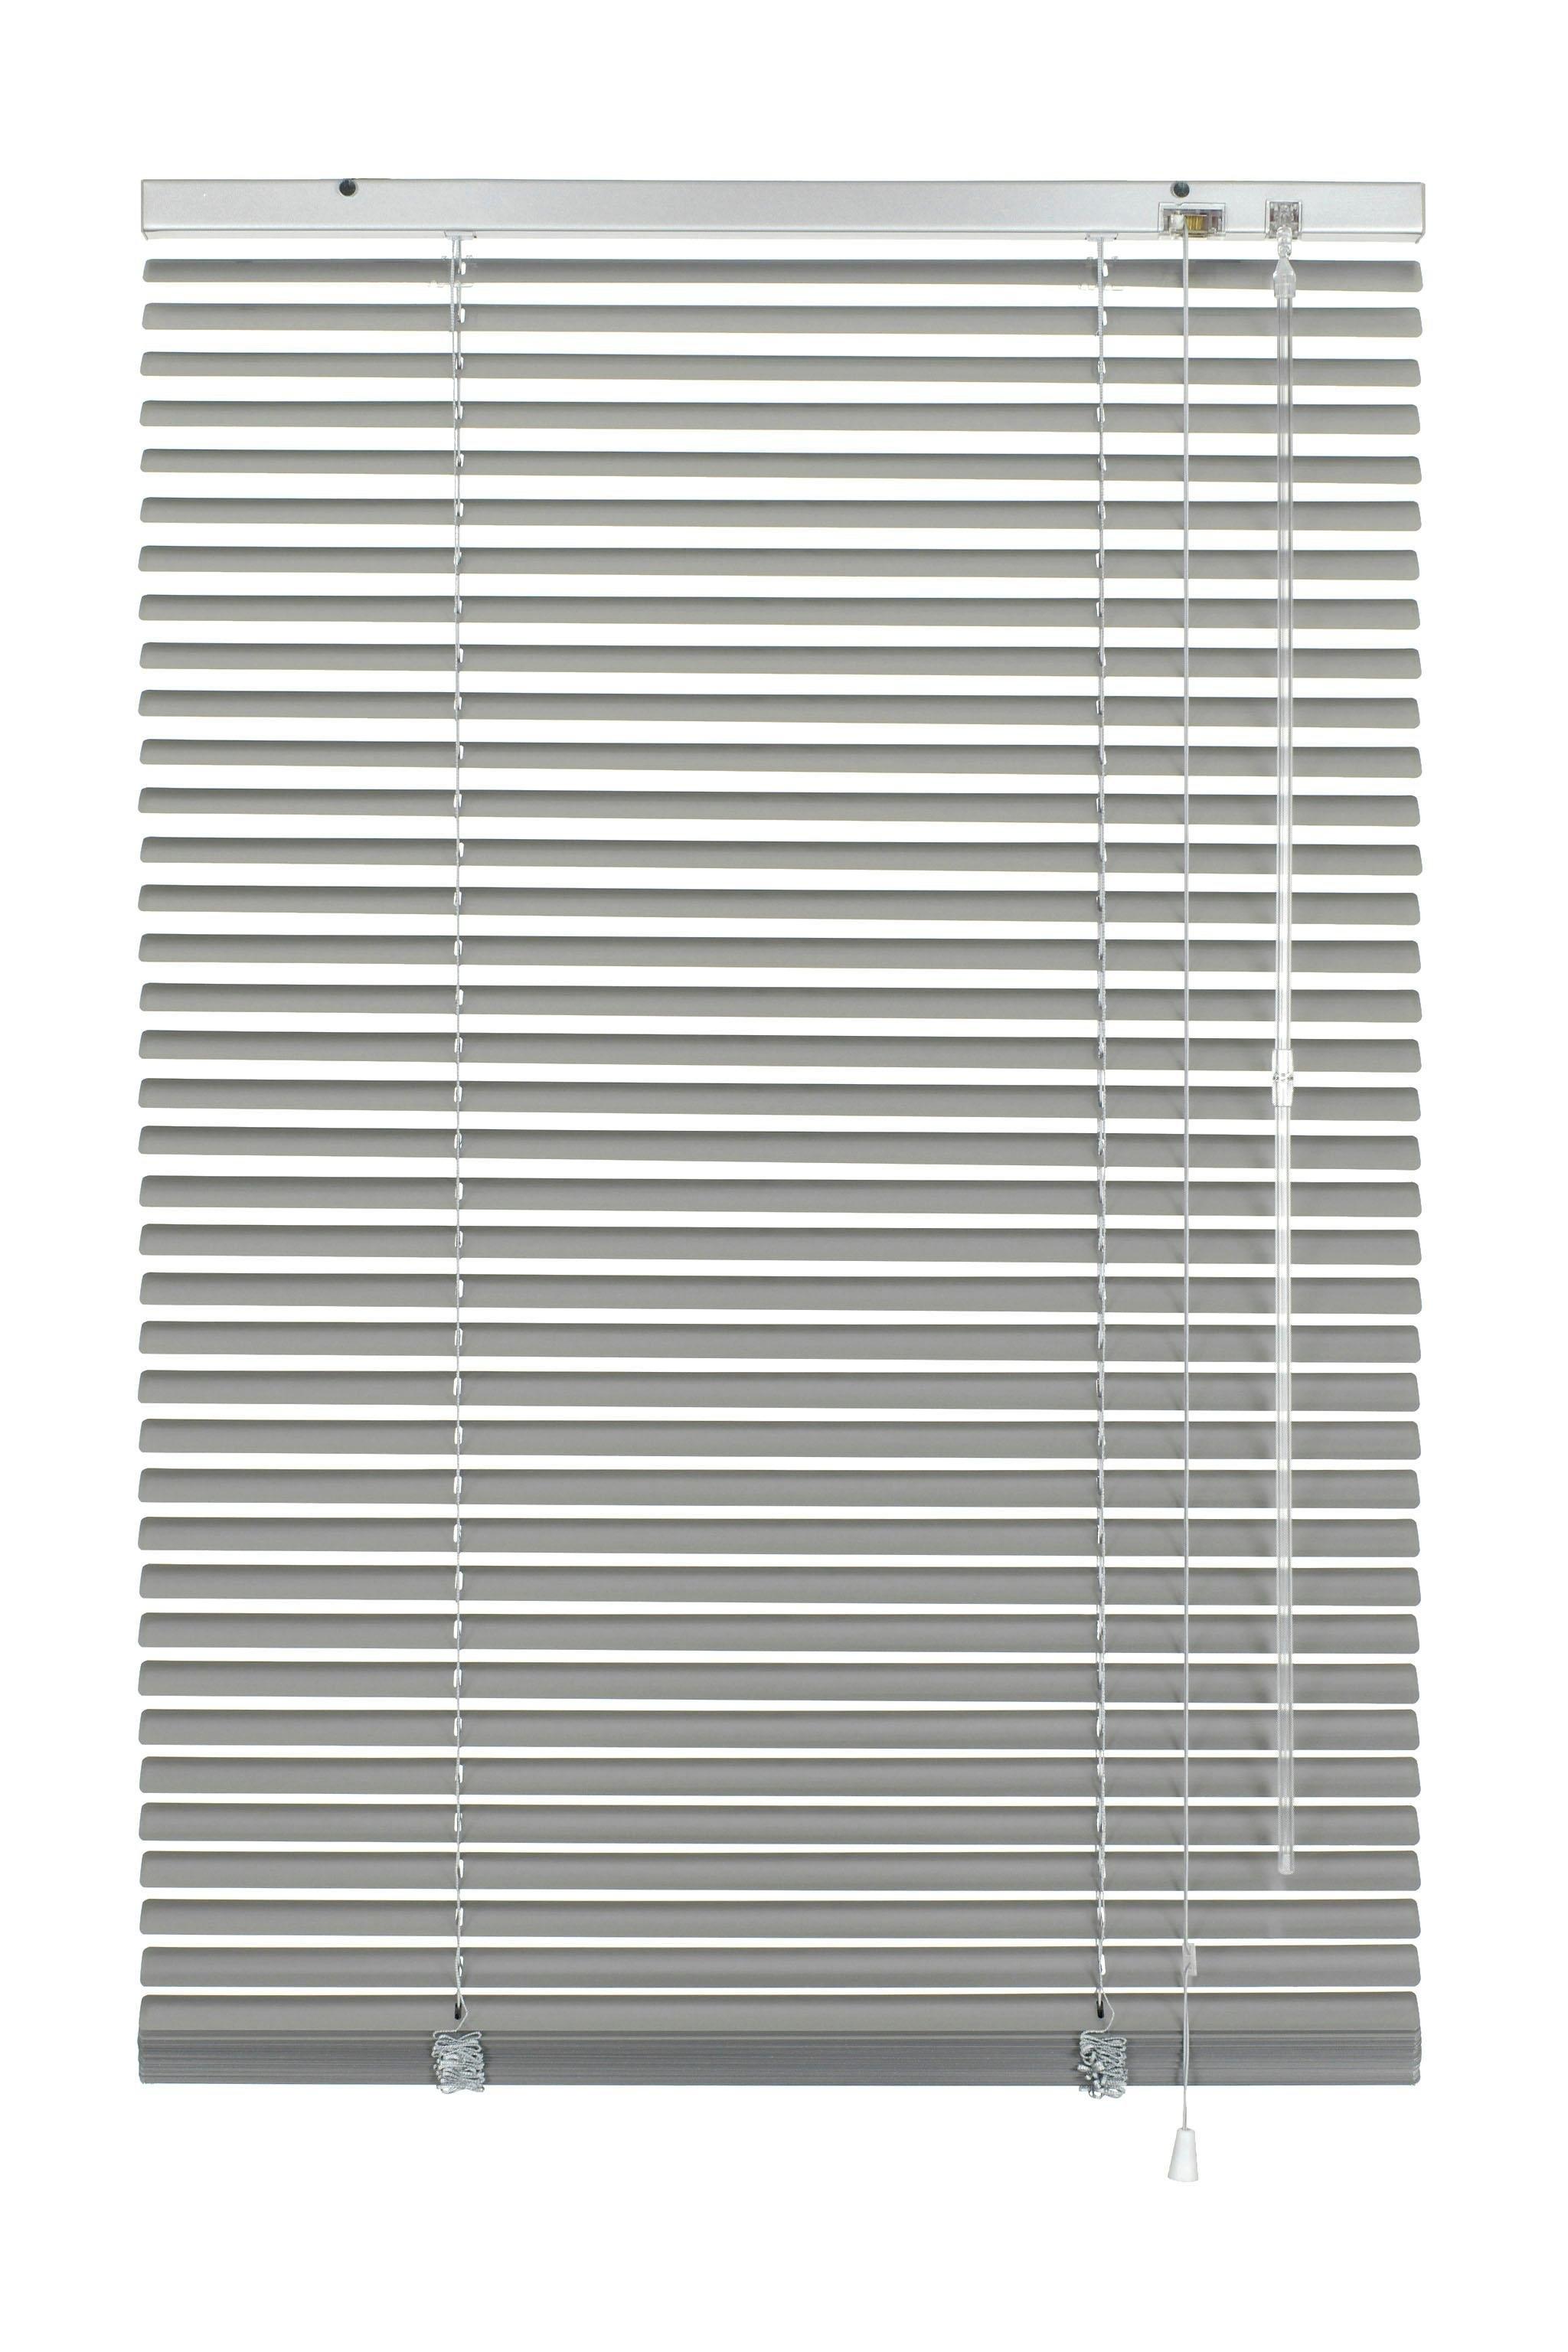 GARDINIA jaloezie Aluminium-jaloezie 25 mm (1 stuk) nu online bestellen